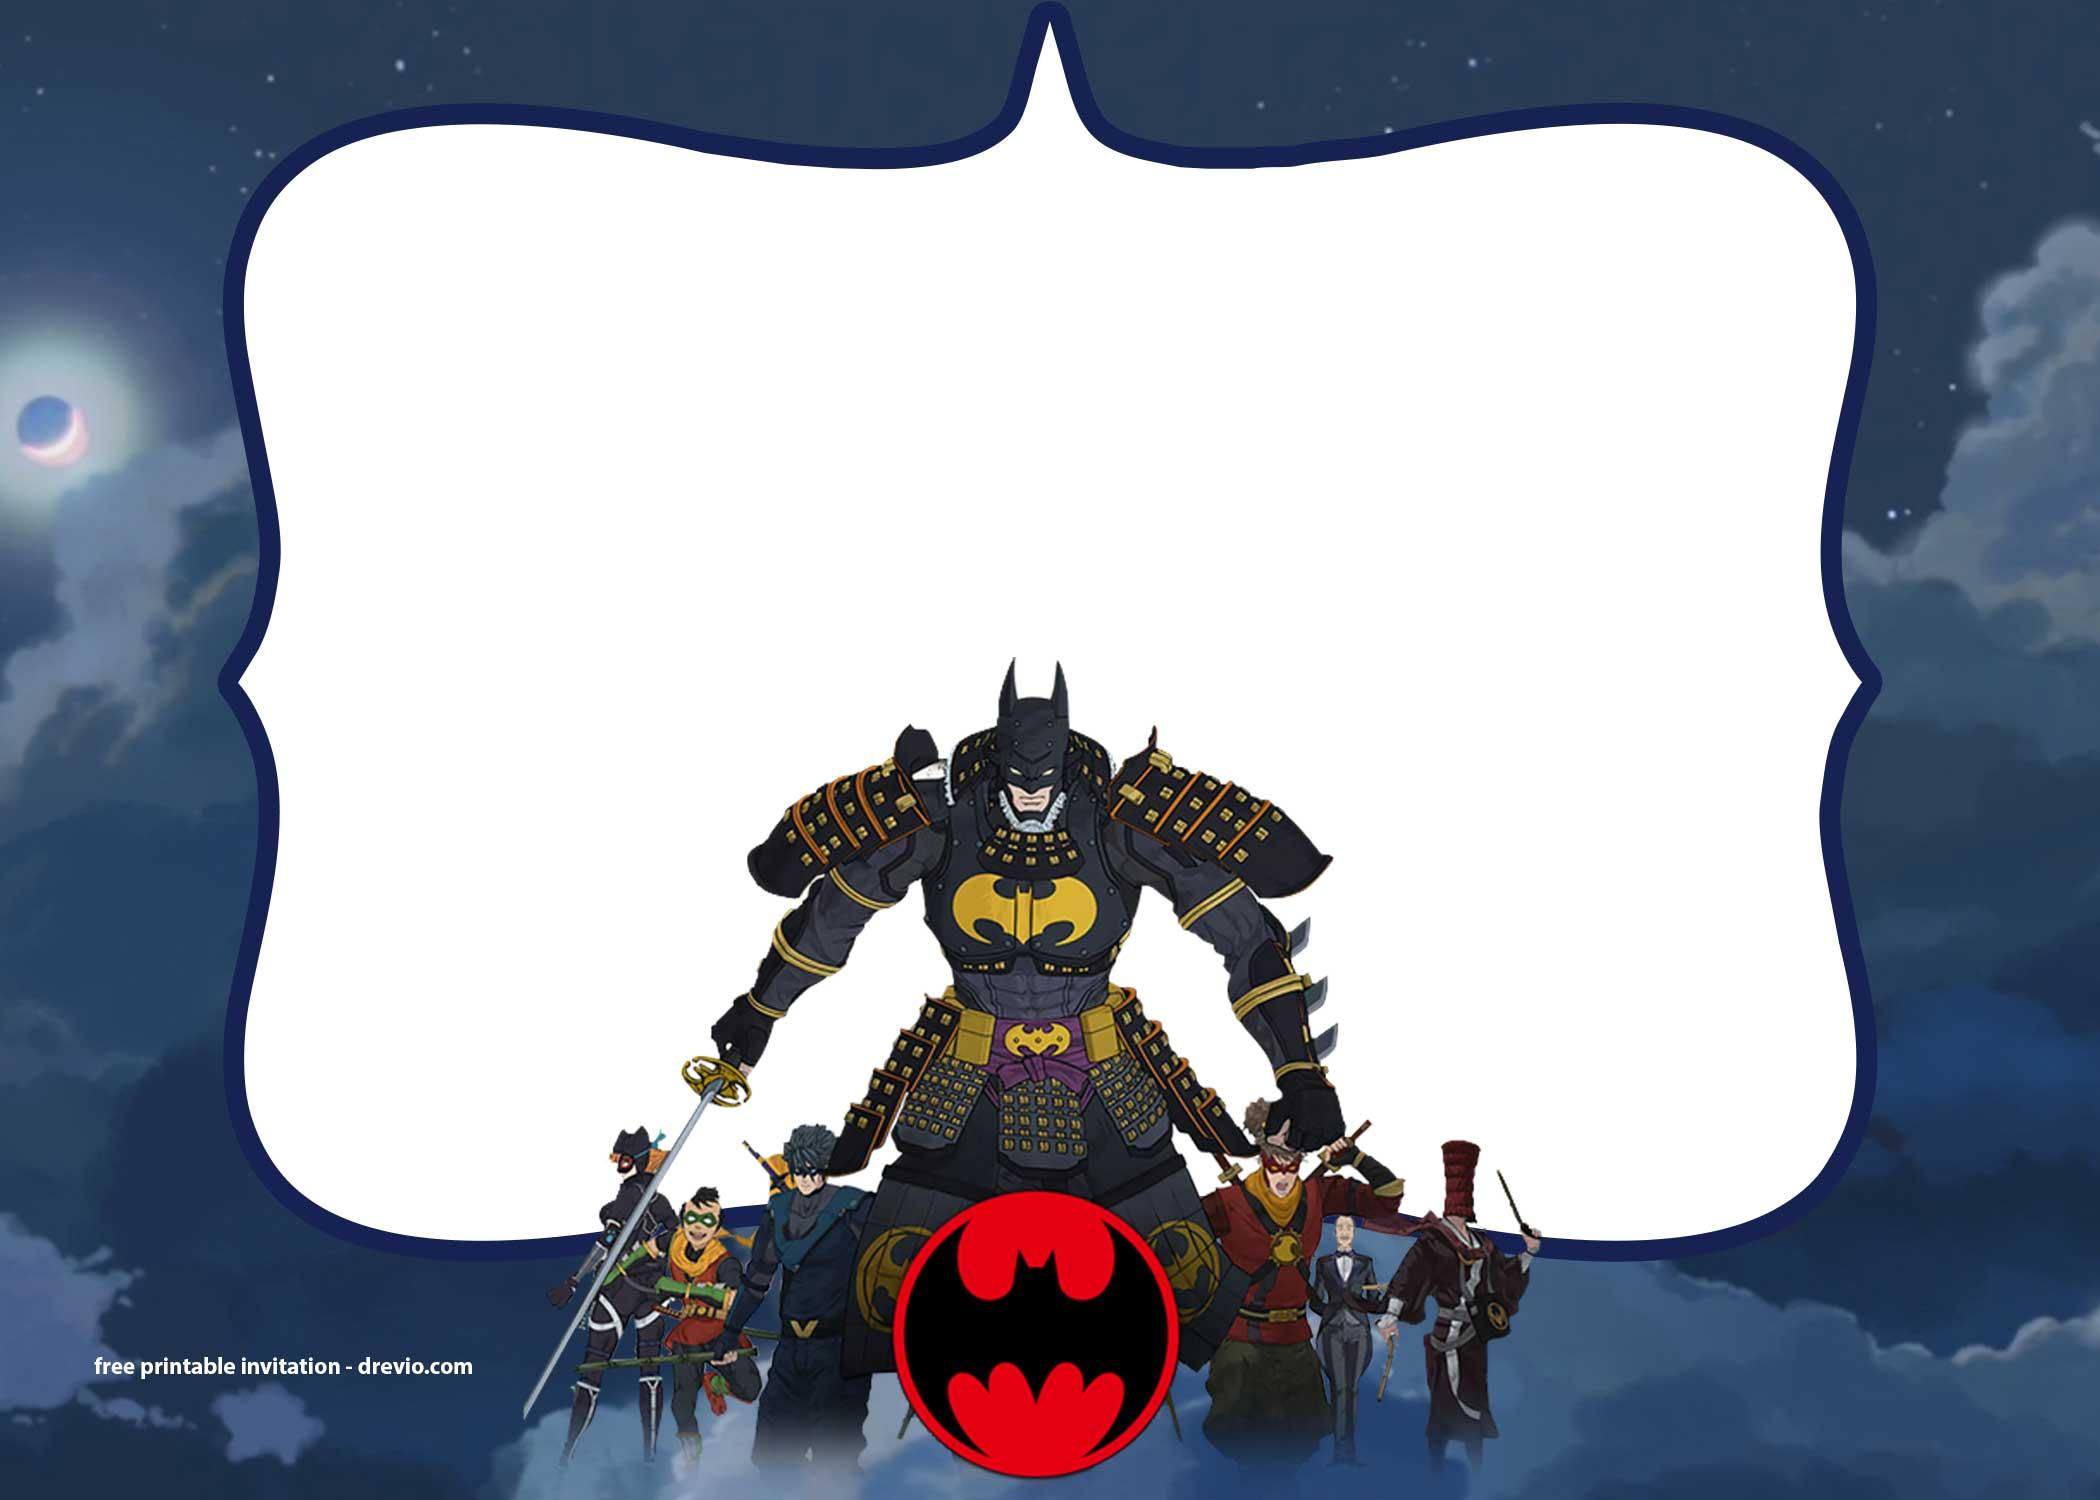 Free Printable Batman Invitation Template